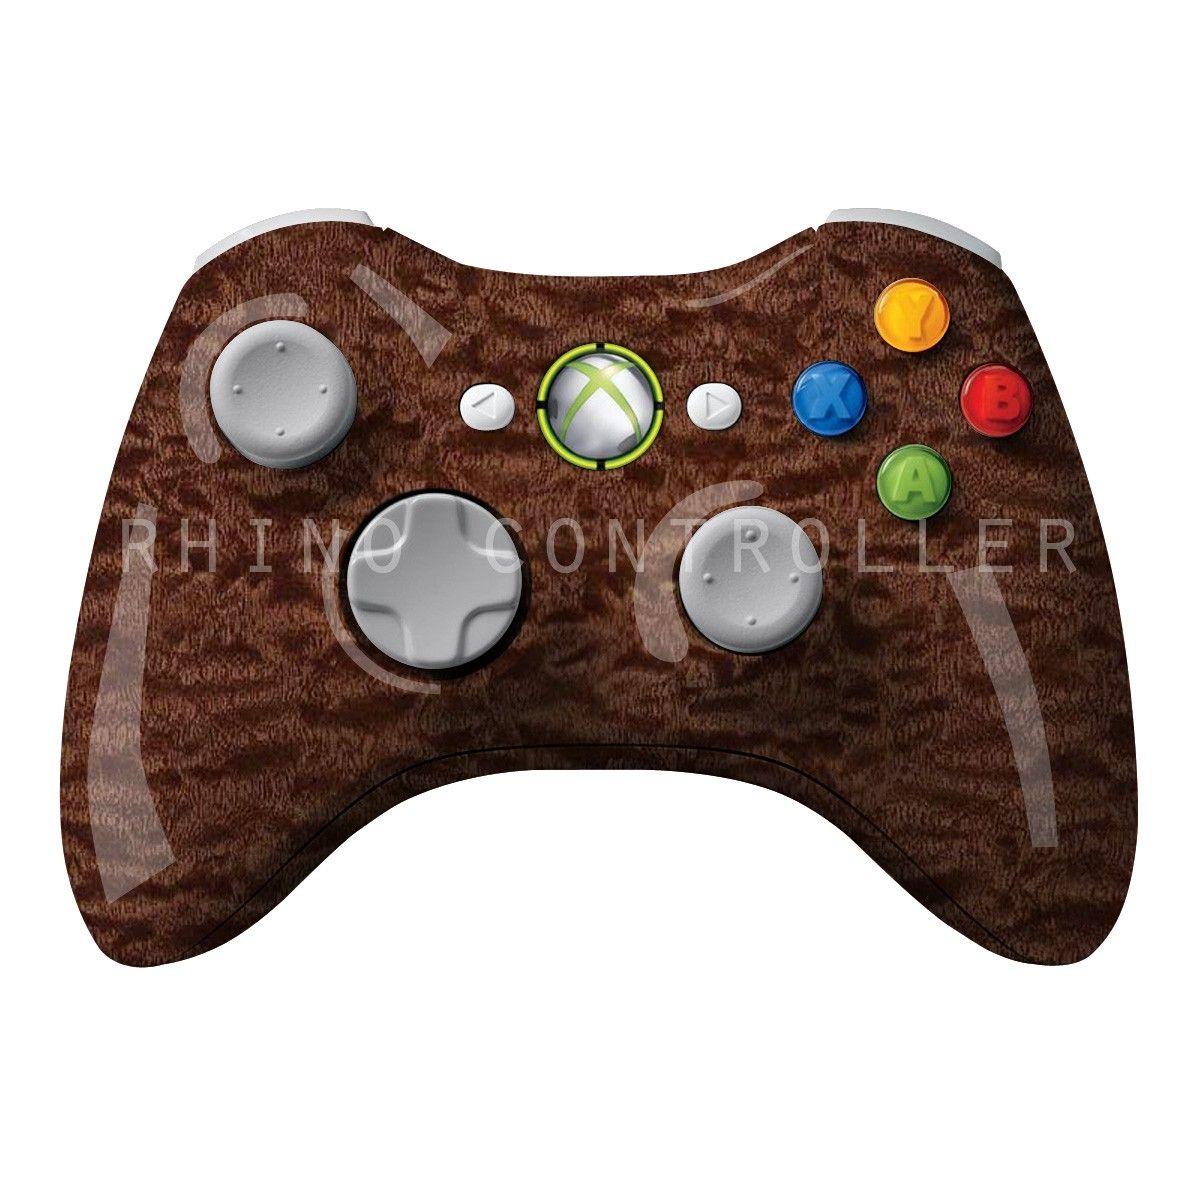 Rh Xbox Rhino Controllers Custom Xbox Xbox 360 Controller Xbox